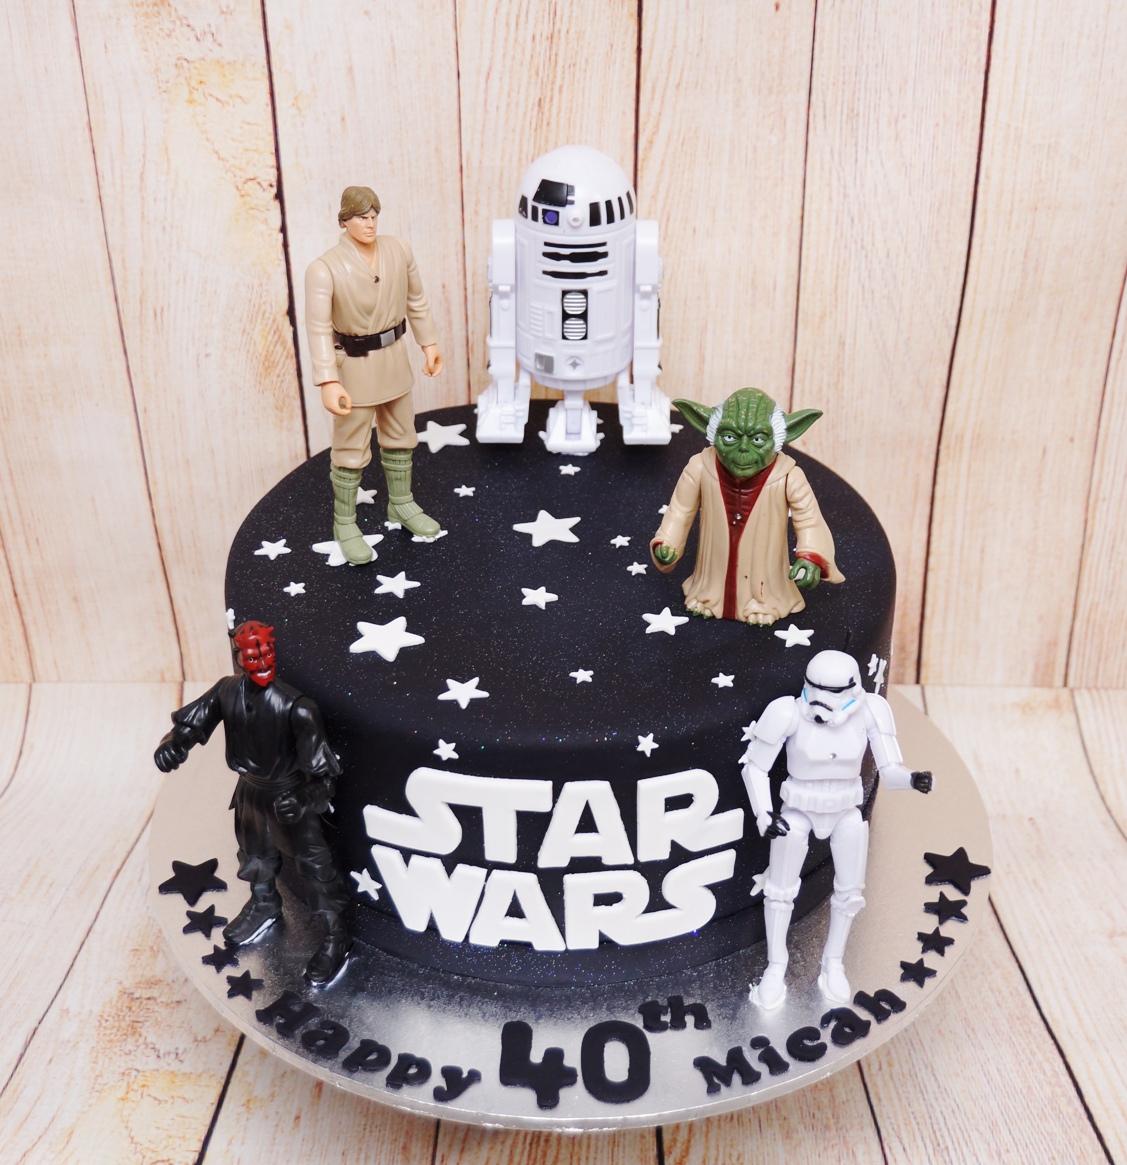 Star Wars 16.11.19 2